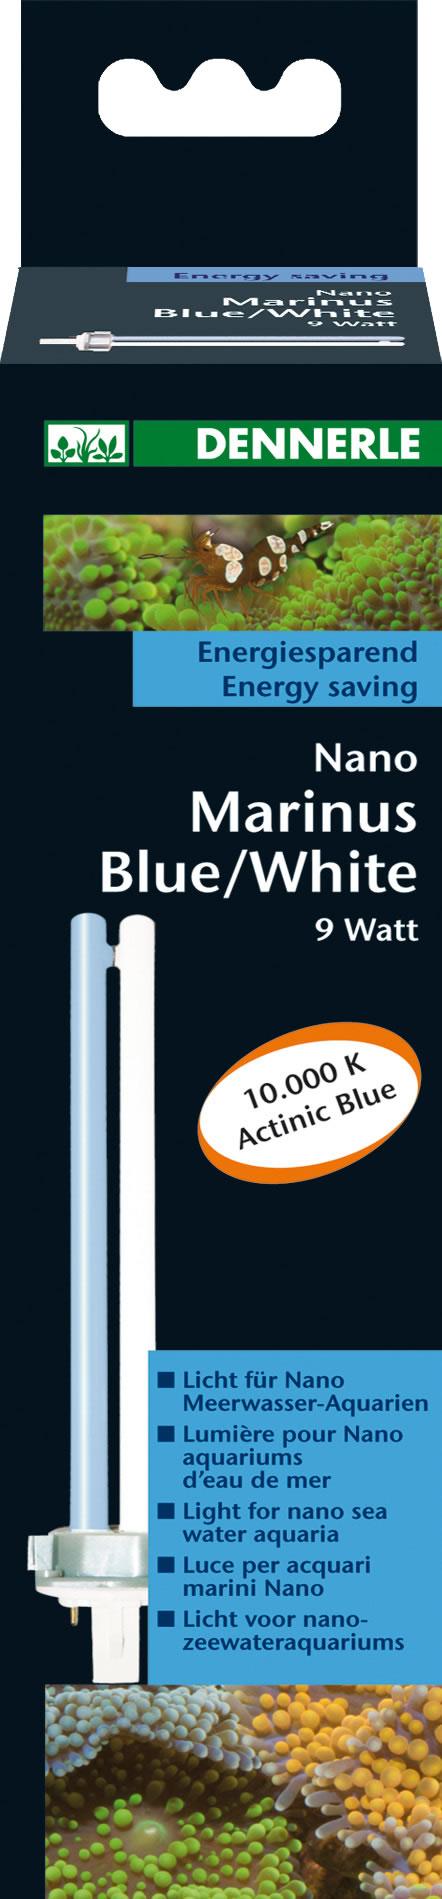 Dennerle Nano Marinus Blue/White Ersatzleuchte